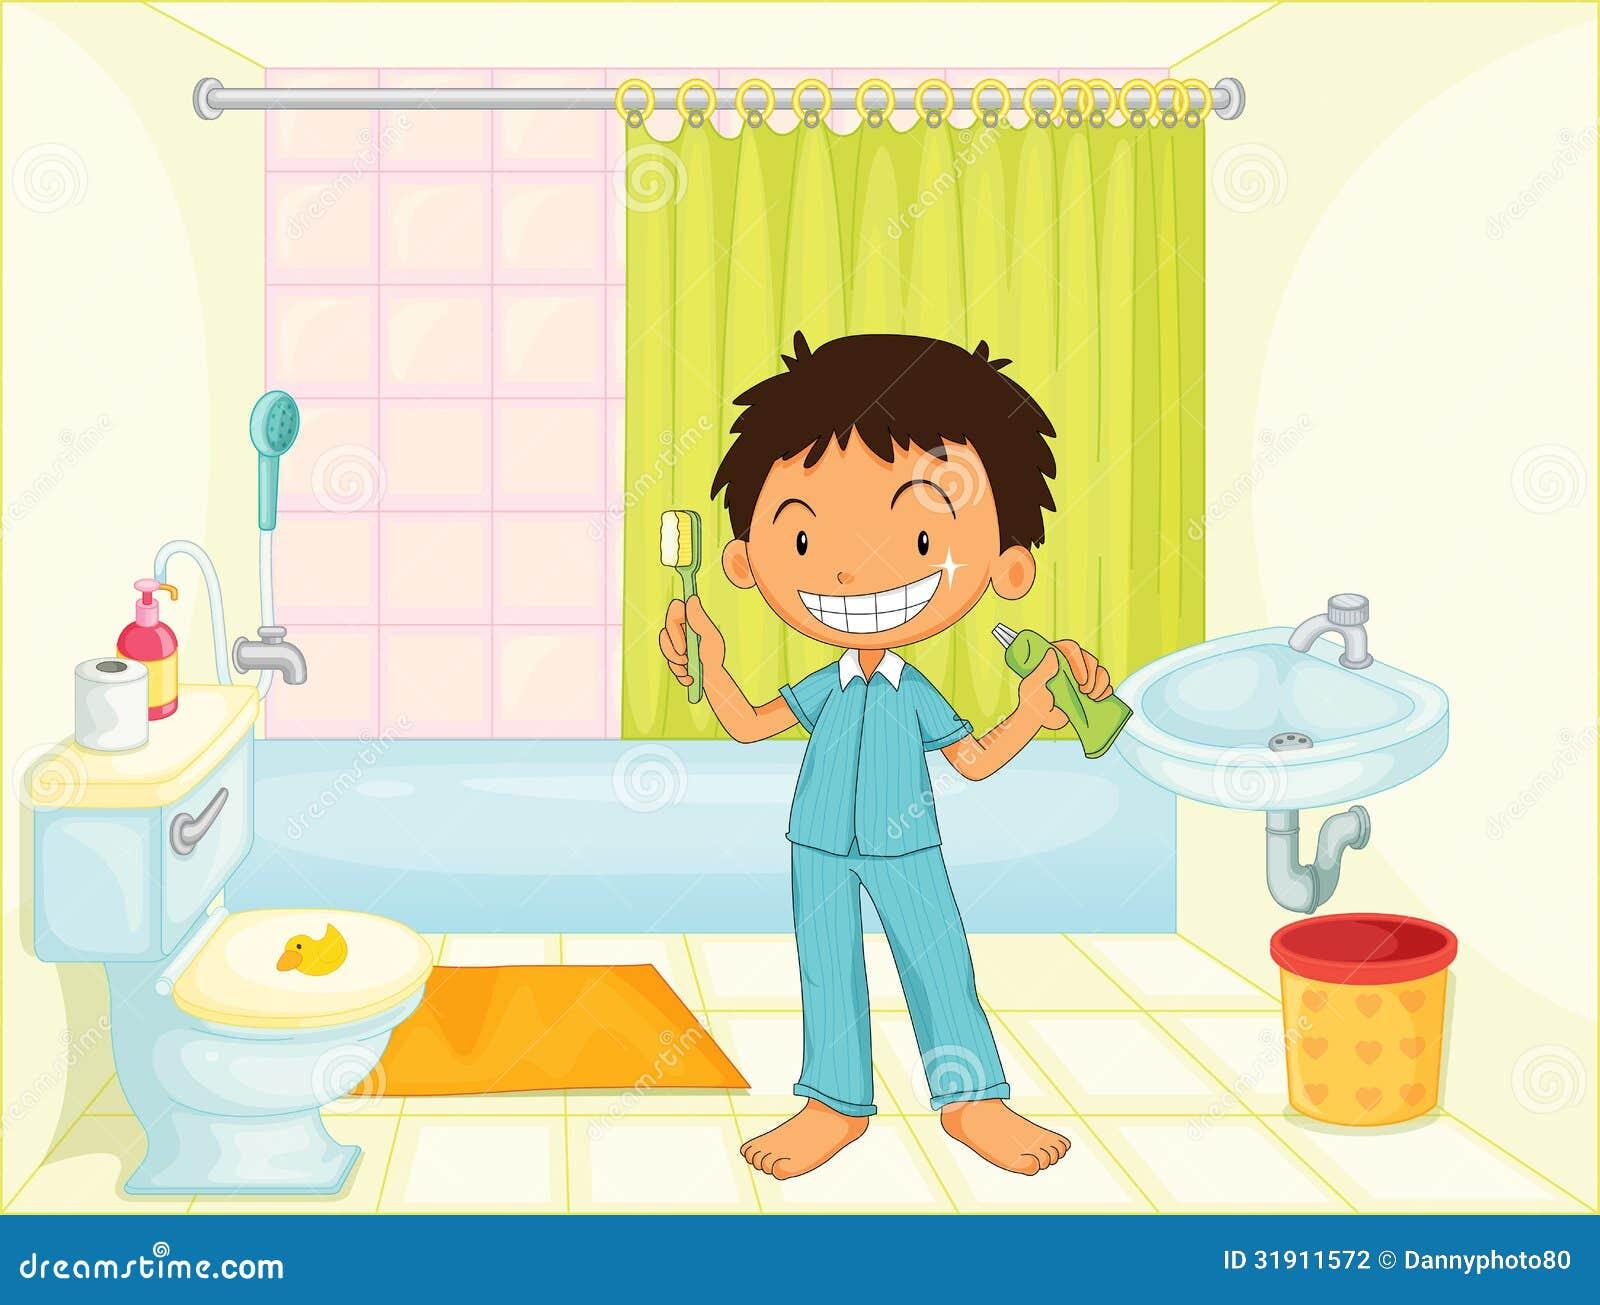 Hands free bathroom faucet